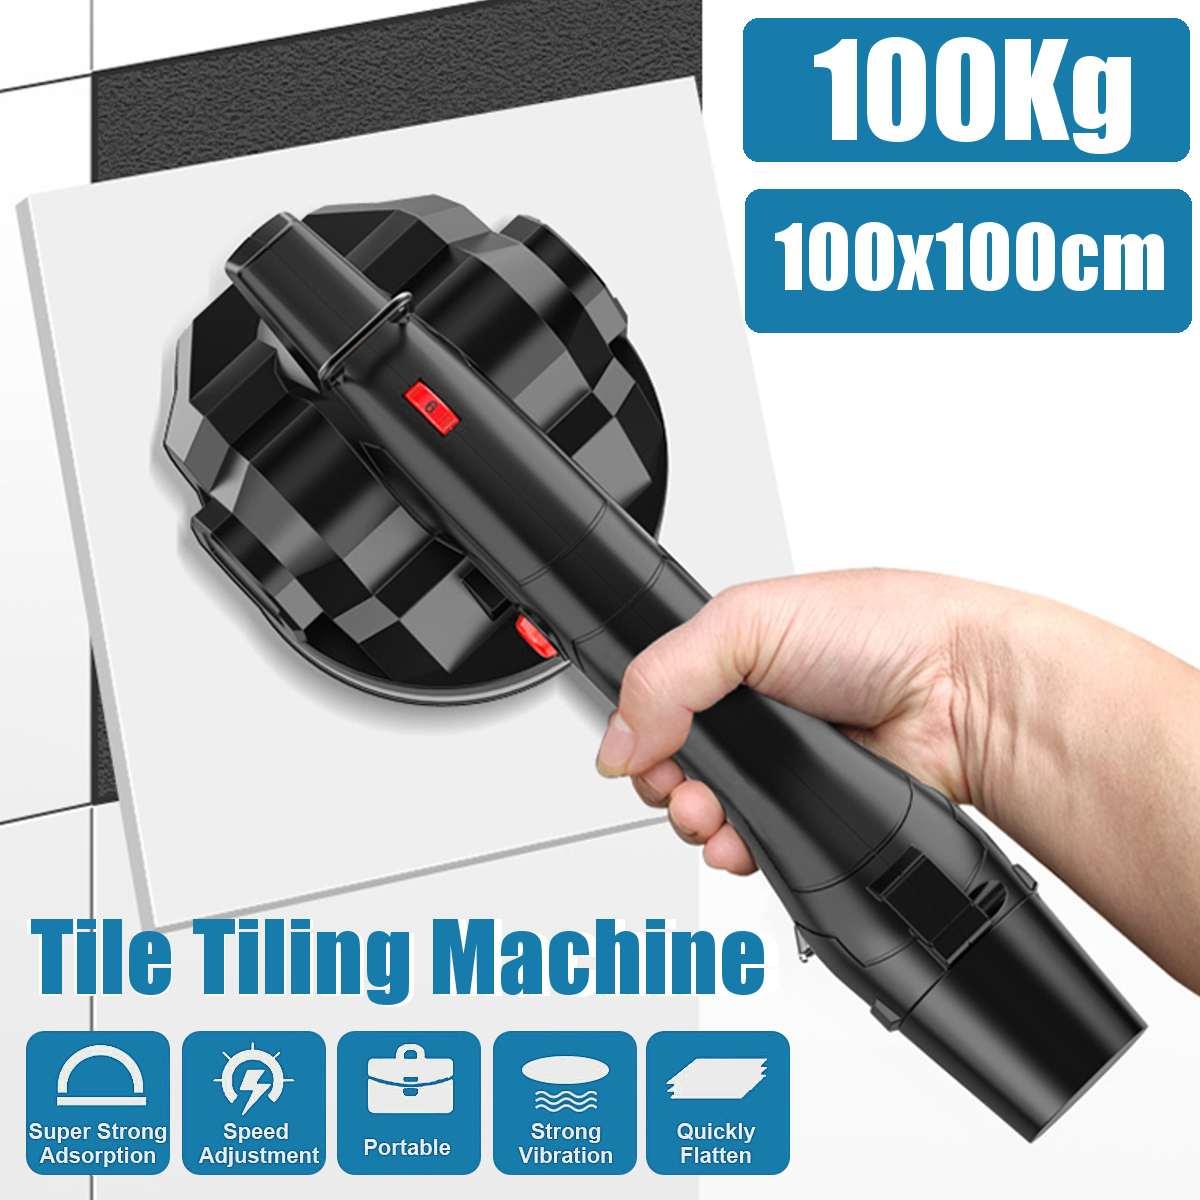 100kg 3000mAh 600W Tile Tile Machine Adjustable Floor Installation Tool Tile Suction Floor Wall +2 Battery + Bag